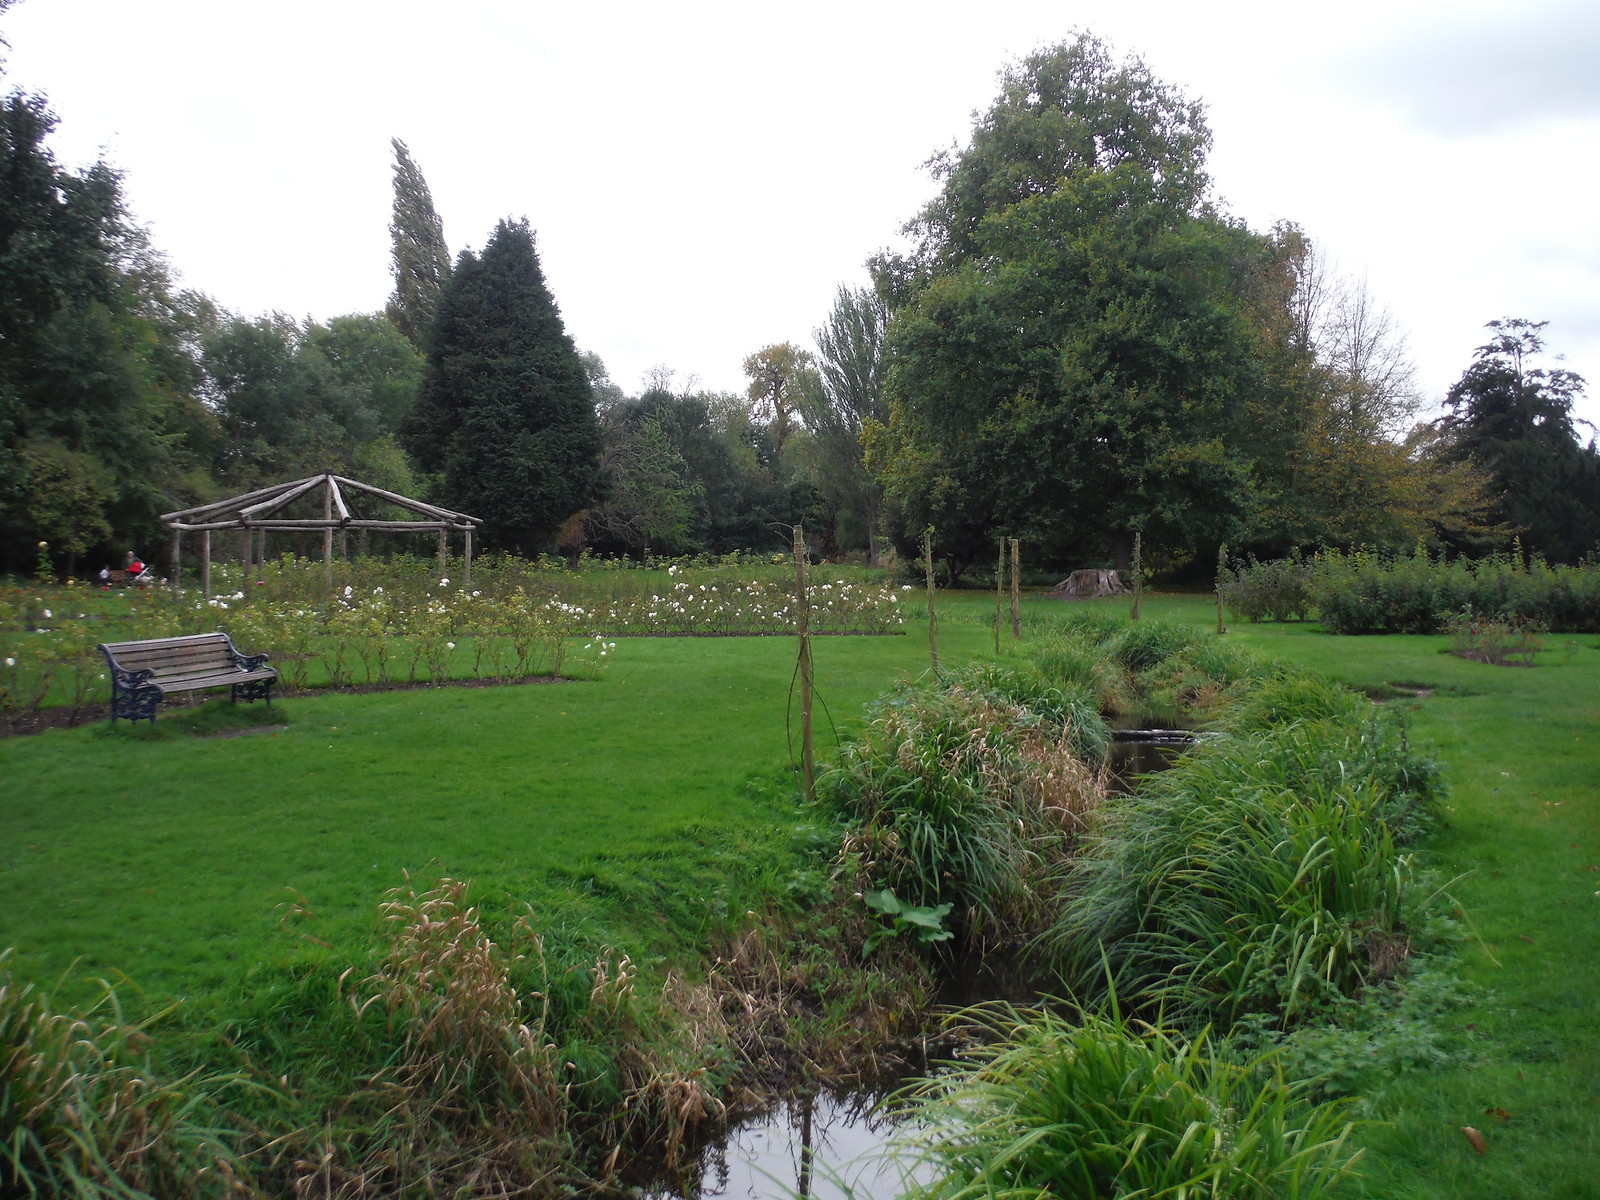 Rose Garden, Morden Hall Park SWC Walk Short 13 - Morden Hall Park and Merton Abbey Mills